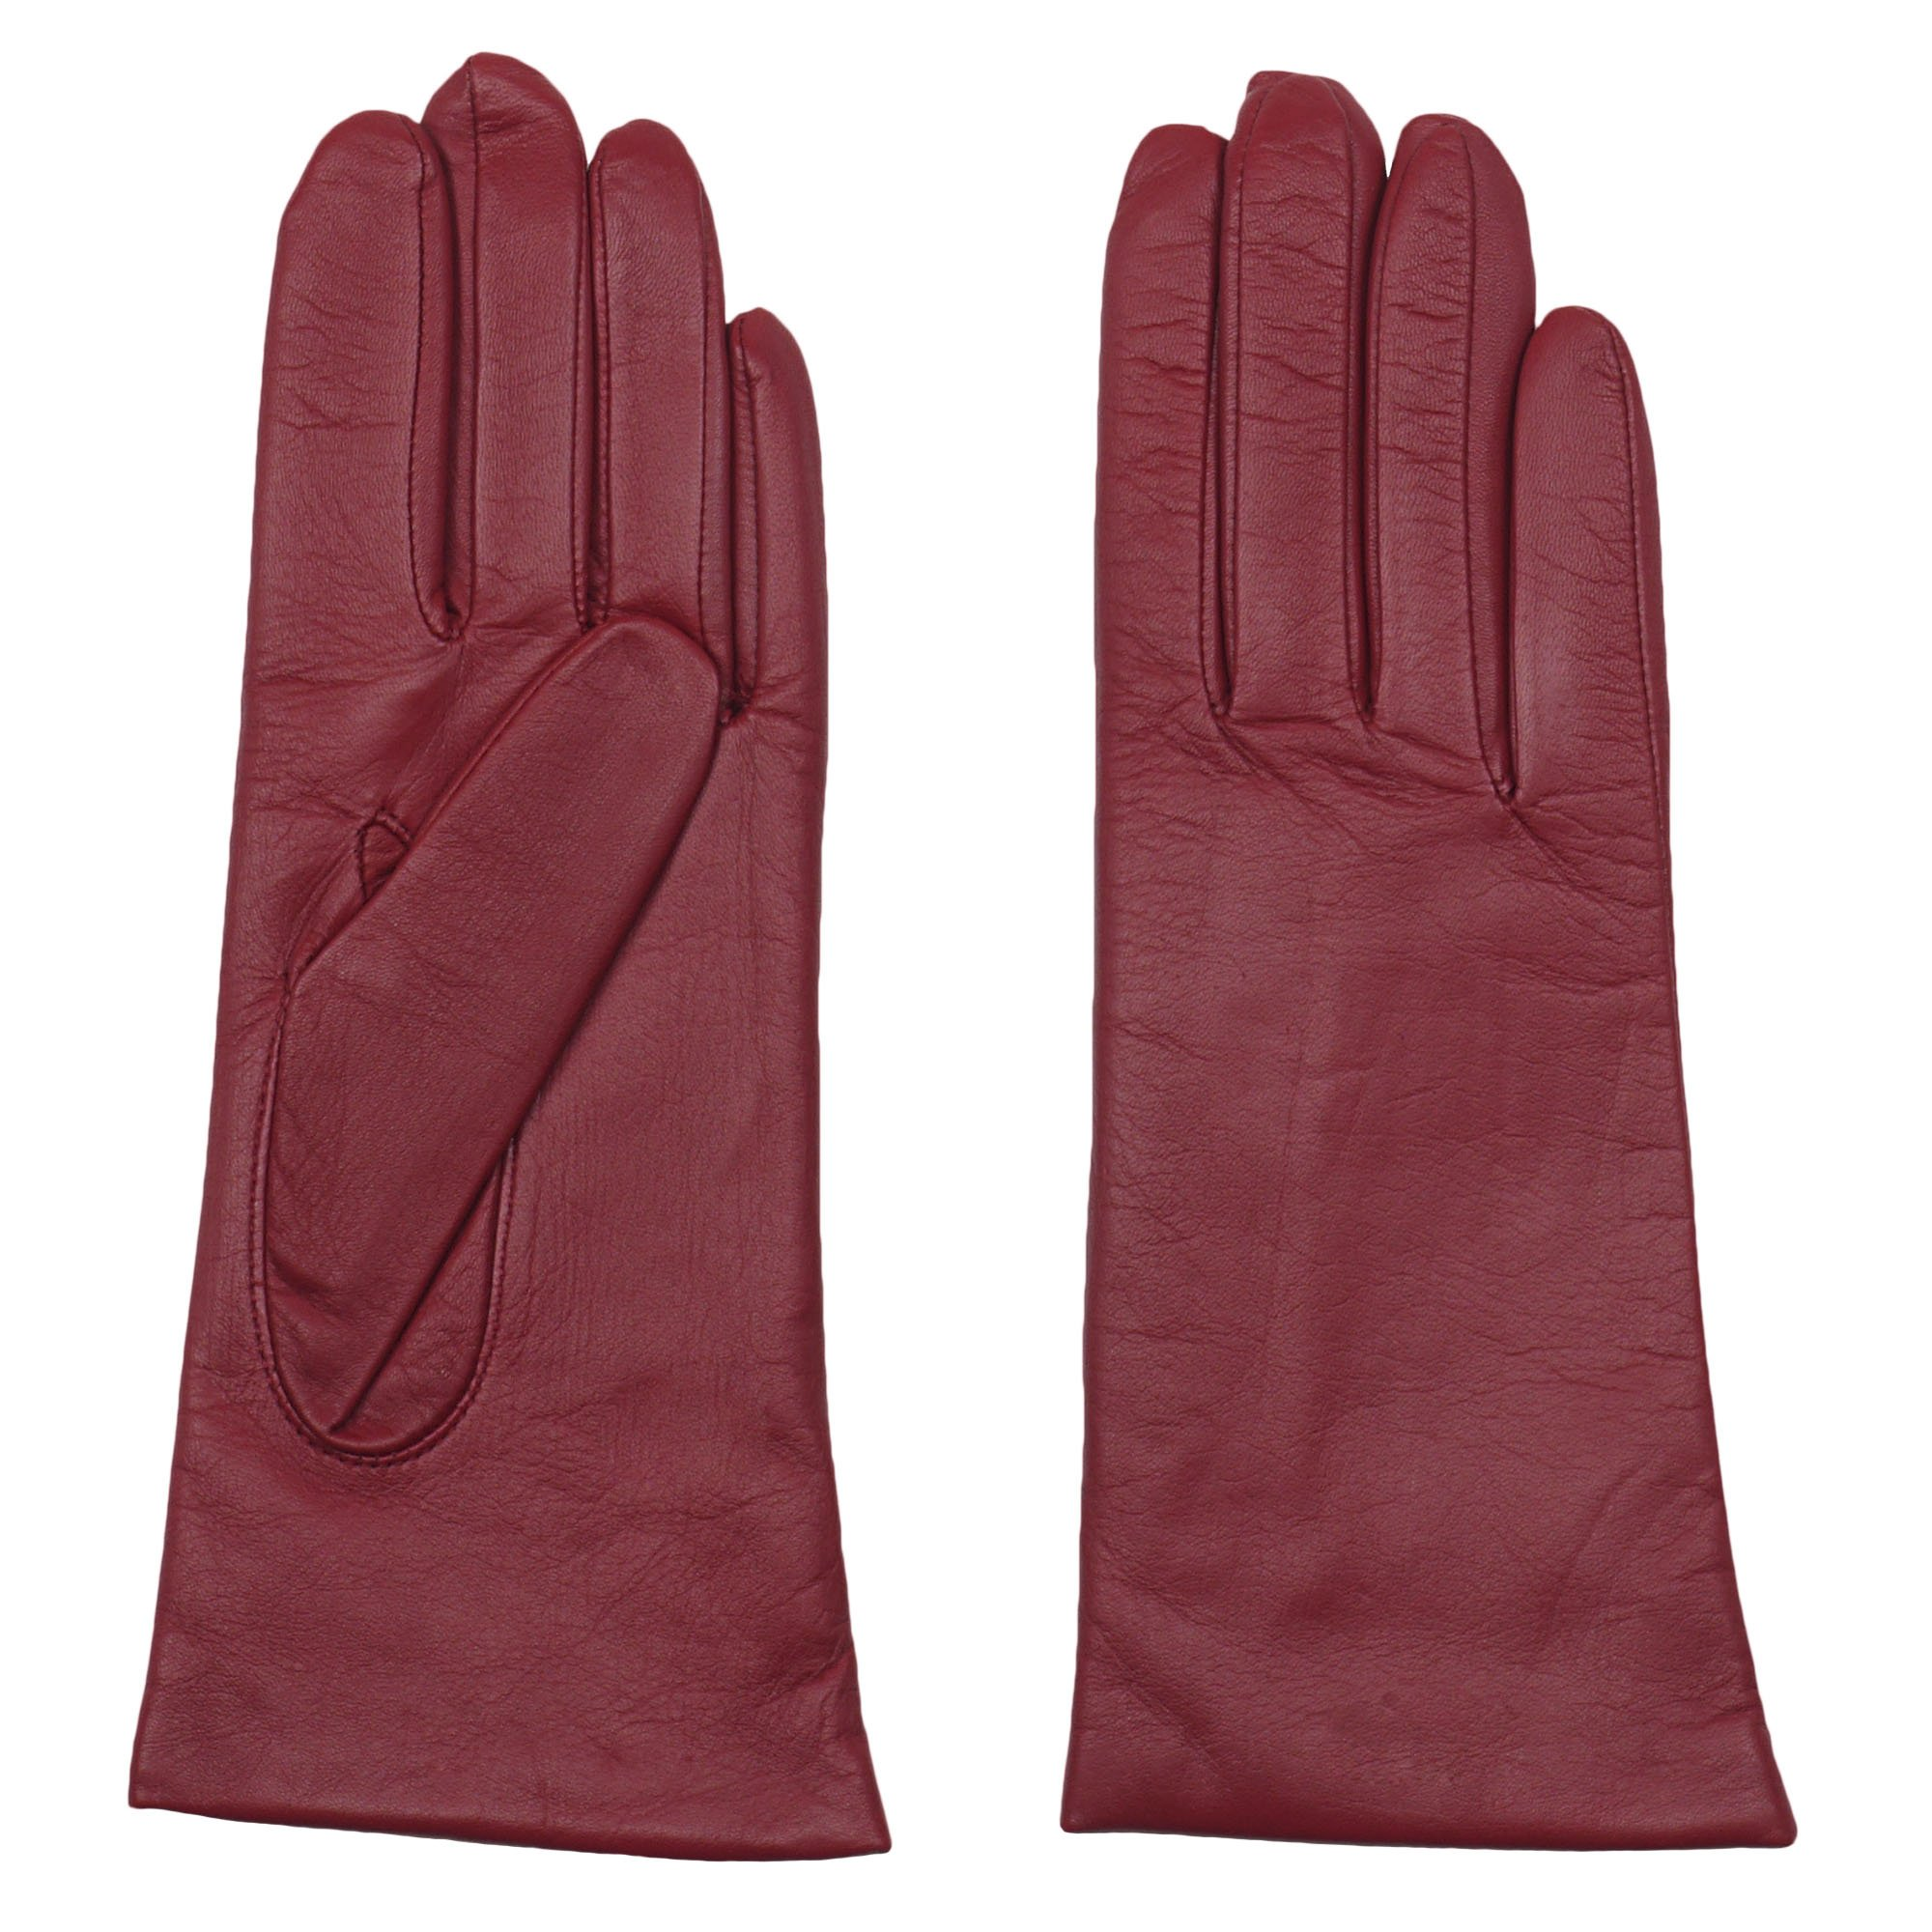 GRANDOE Womens Sheepskin Leather Glove, Cashmere Lined, Chic Modern Winter Wear, Red, M